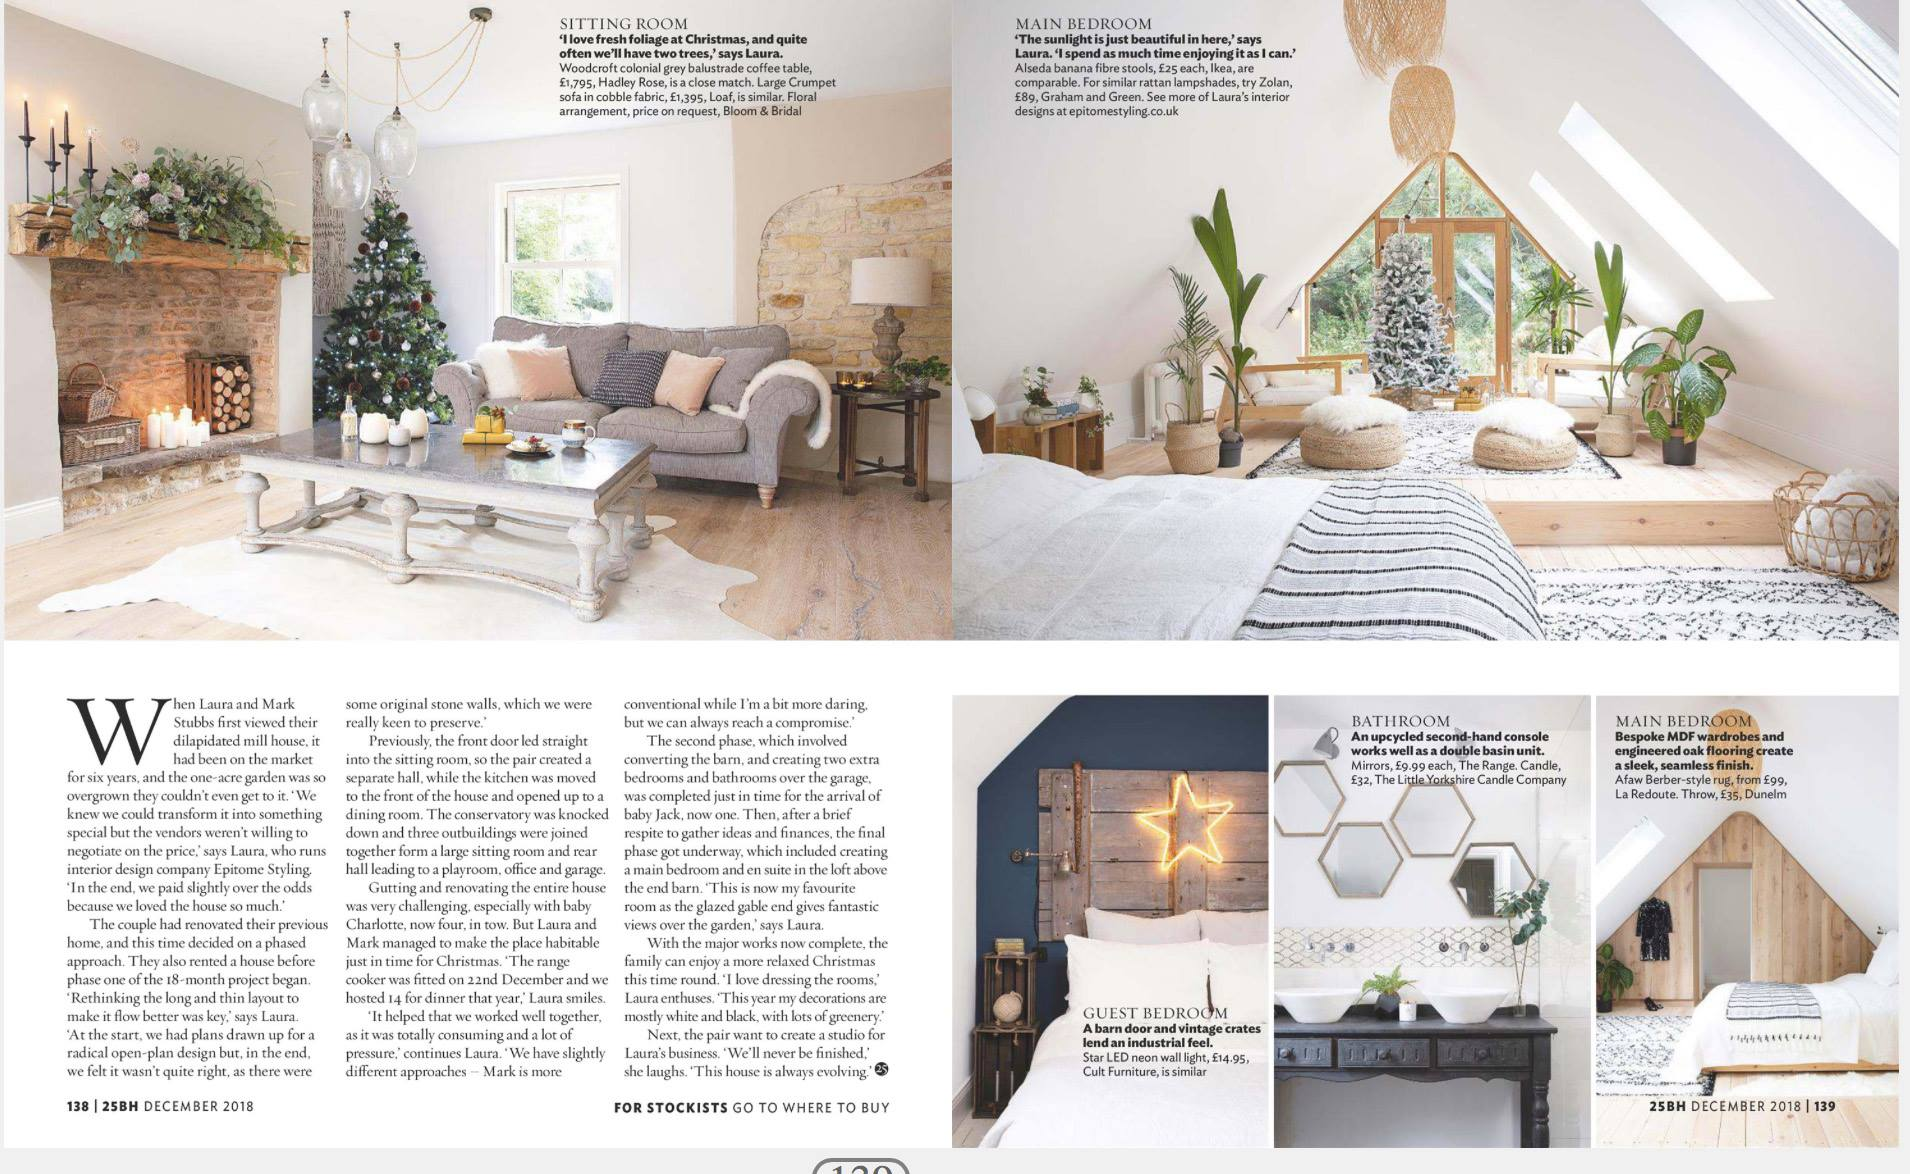 Beautiful Homes in the North magazine photoshoot